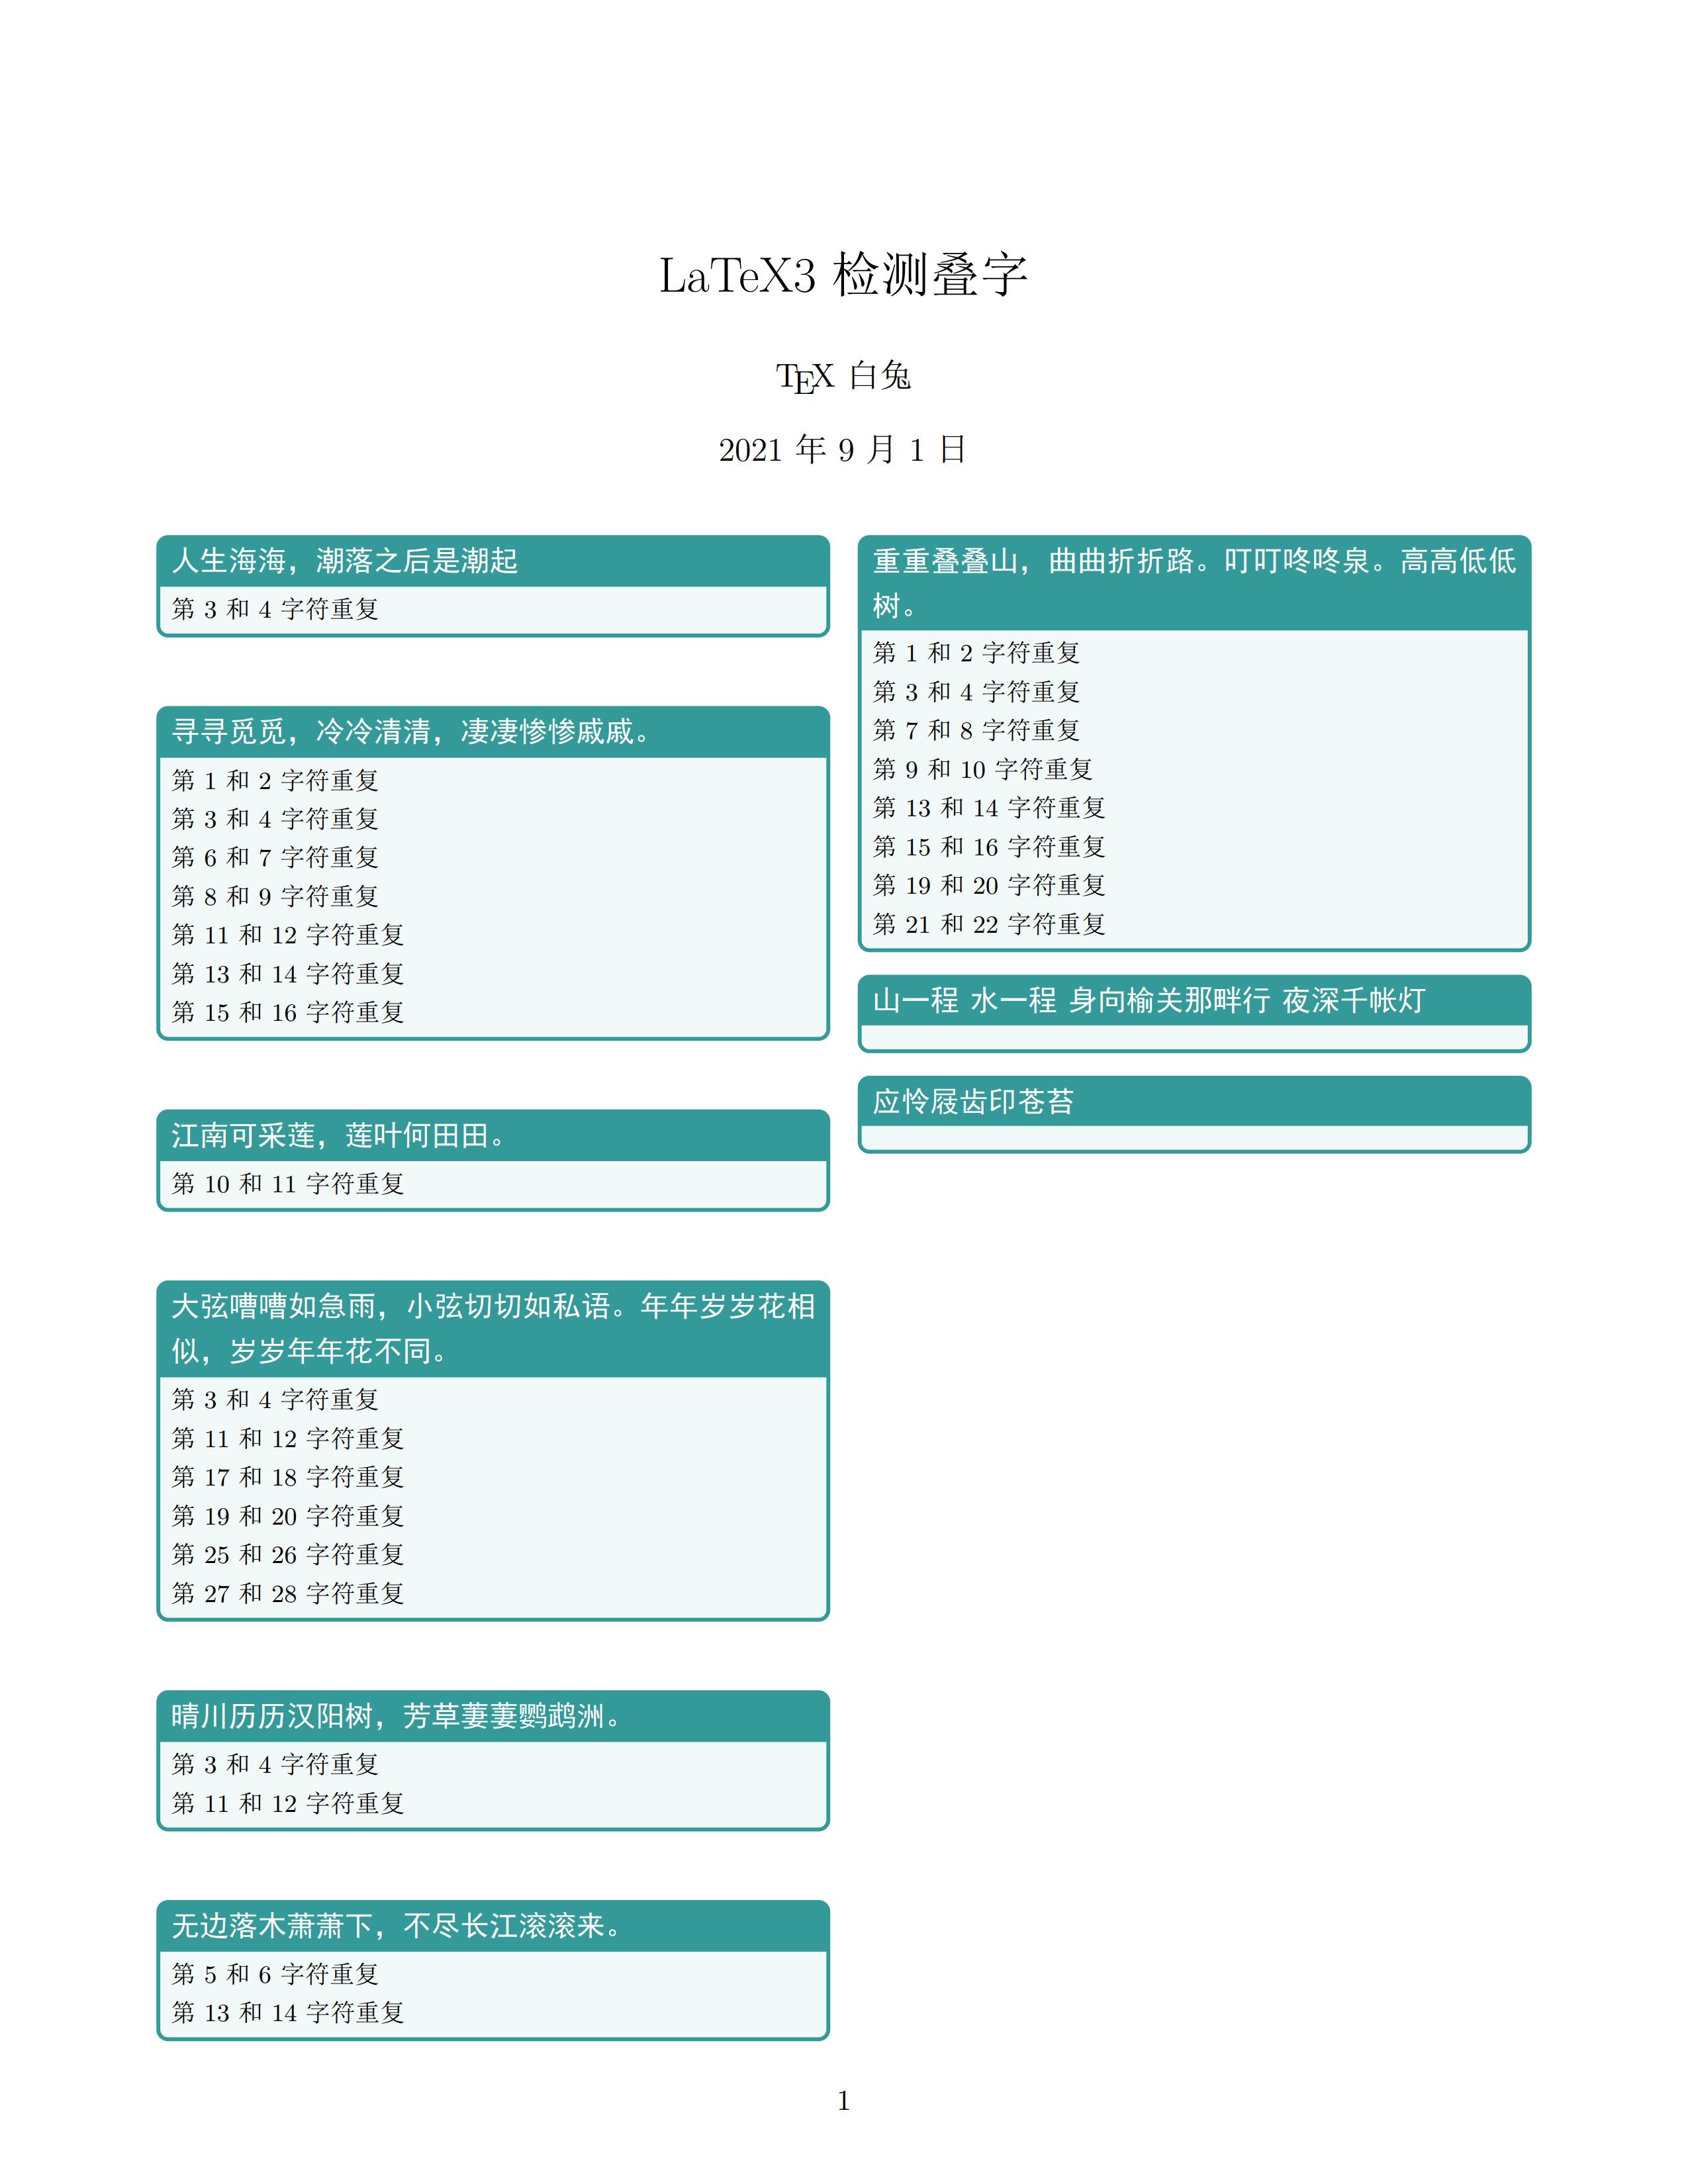 LaTeX3 检测叠字